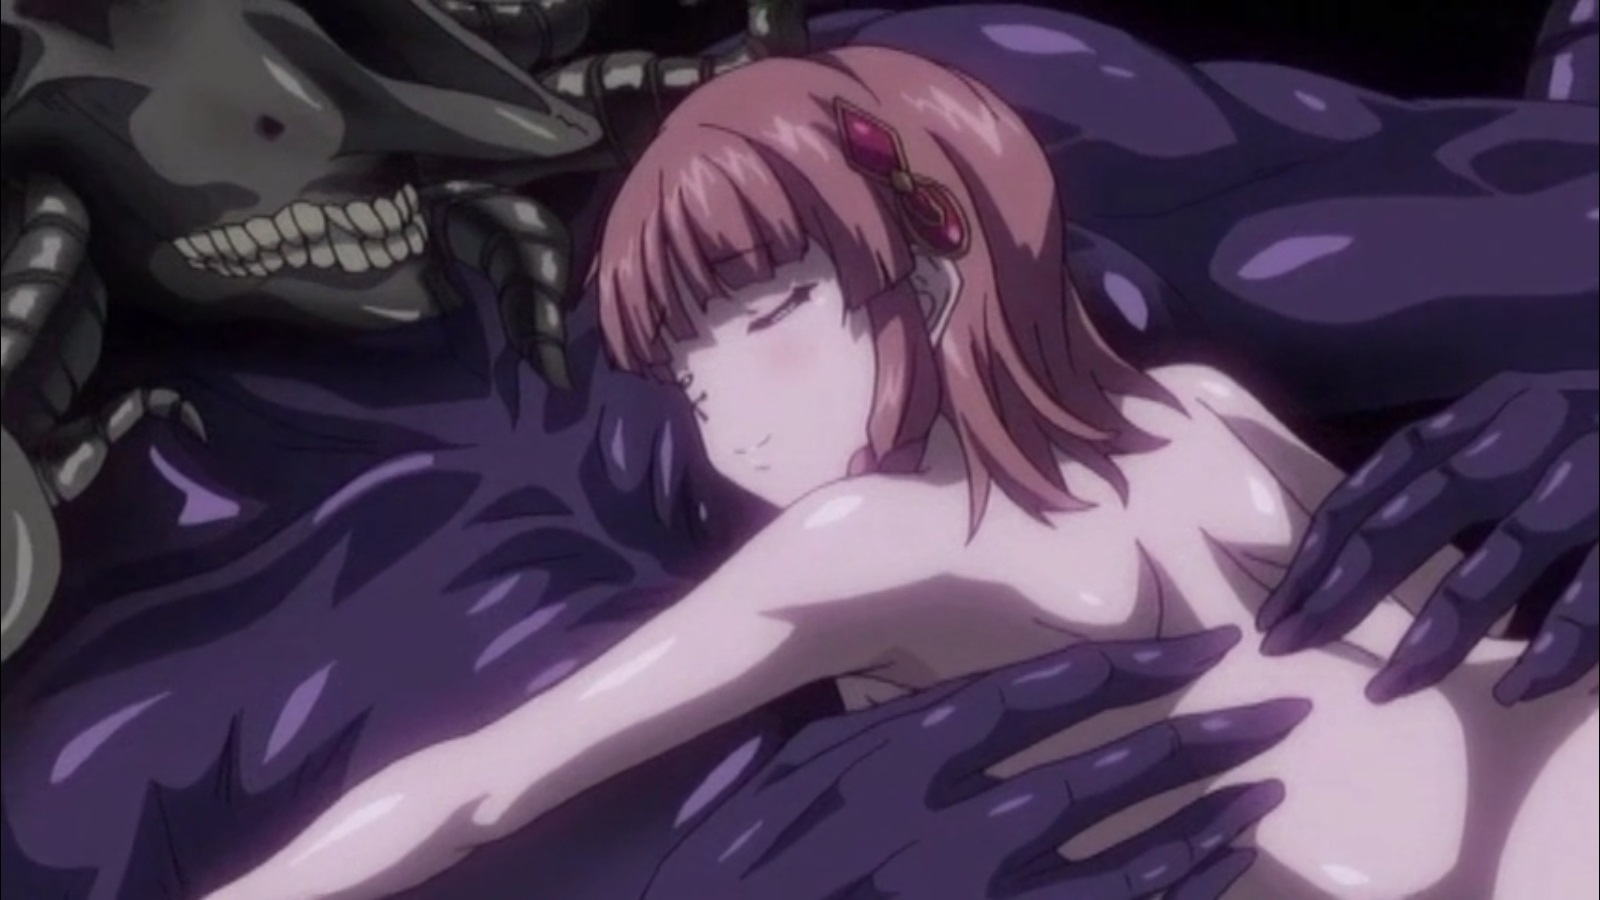 Rape! rape! hentai rape! Anime Hentai